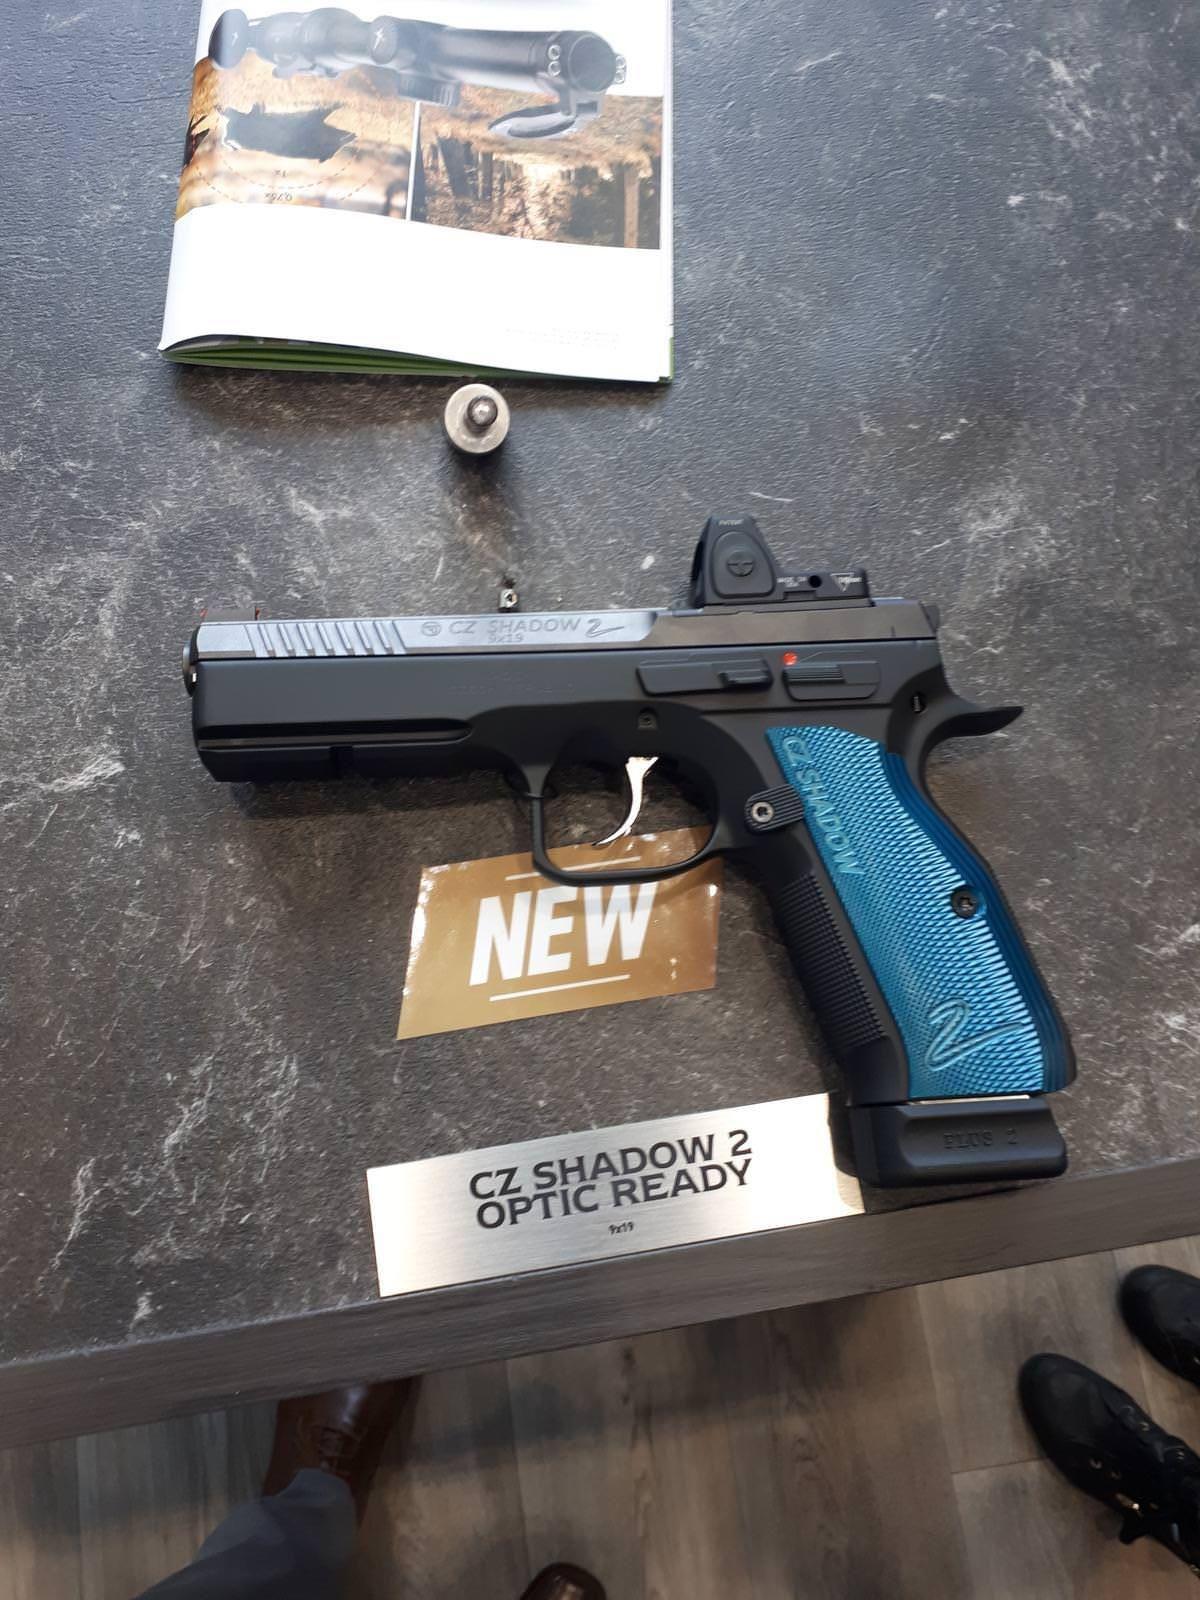 CZ Shadow II Optics Ready Model! | Cz | Hand guns, Guns